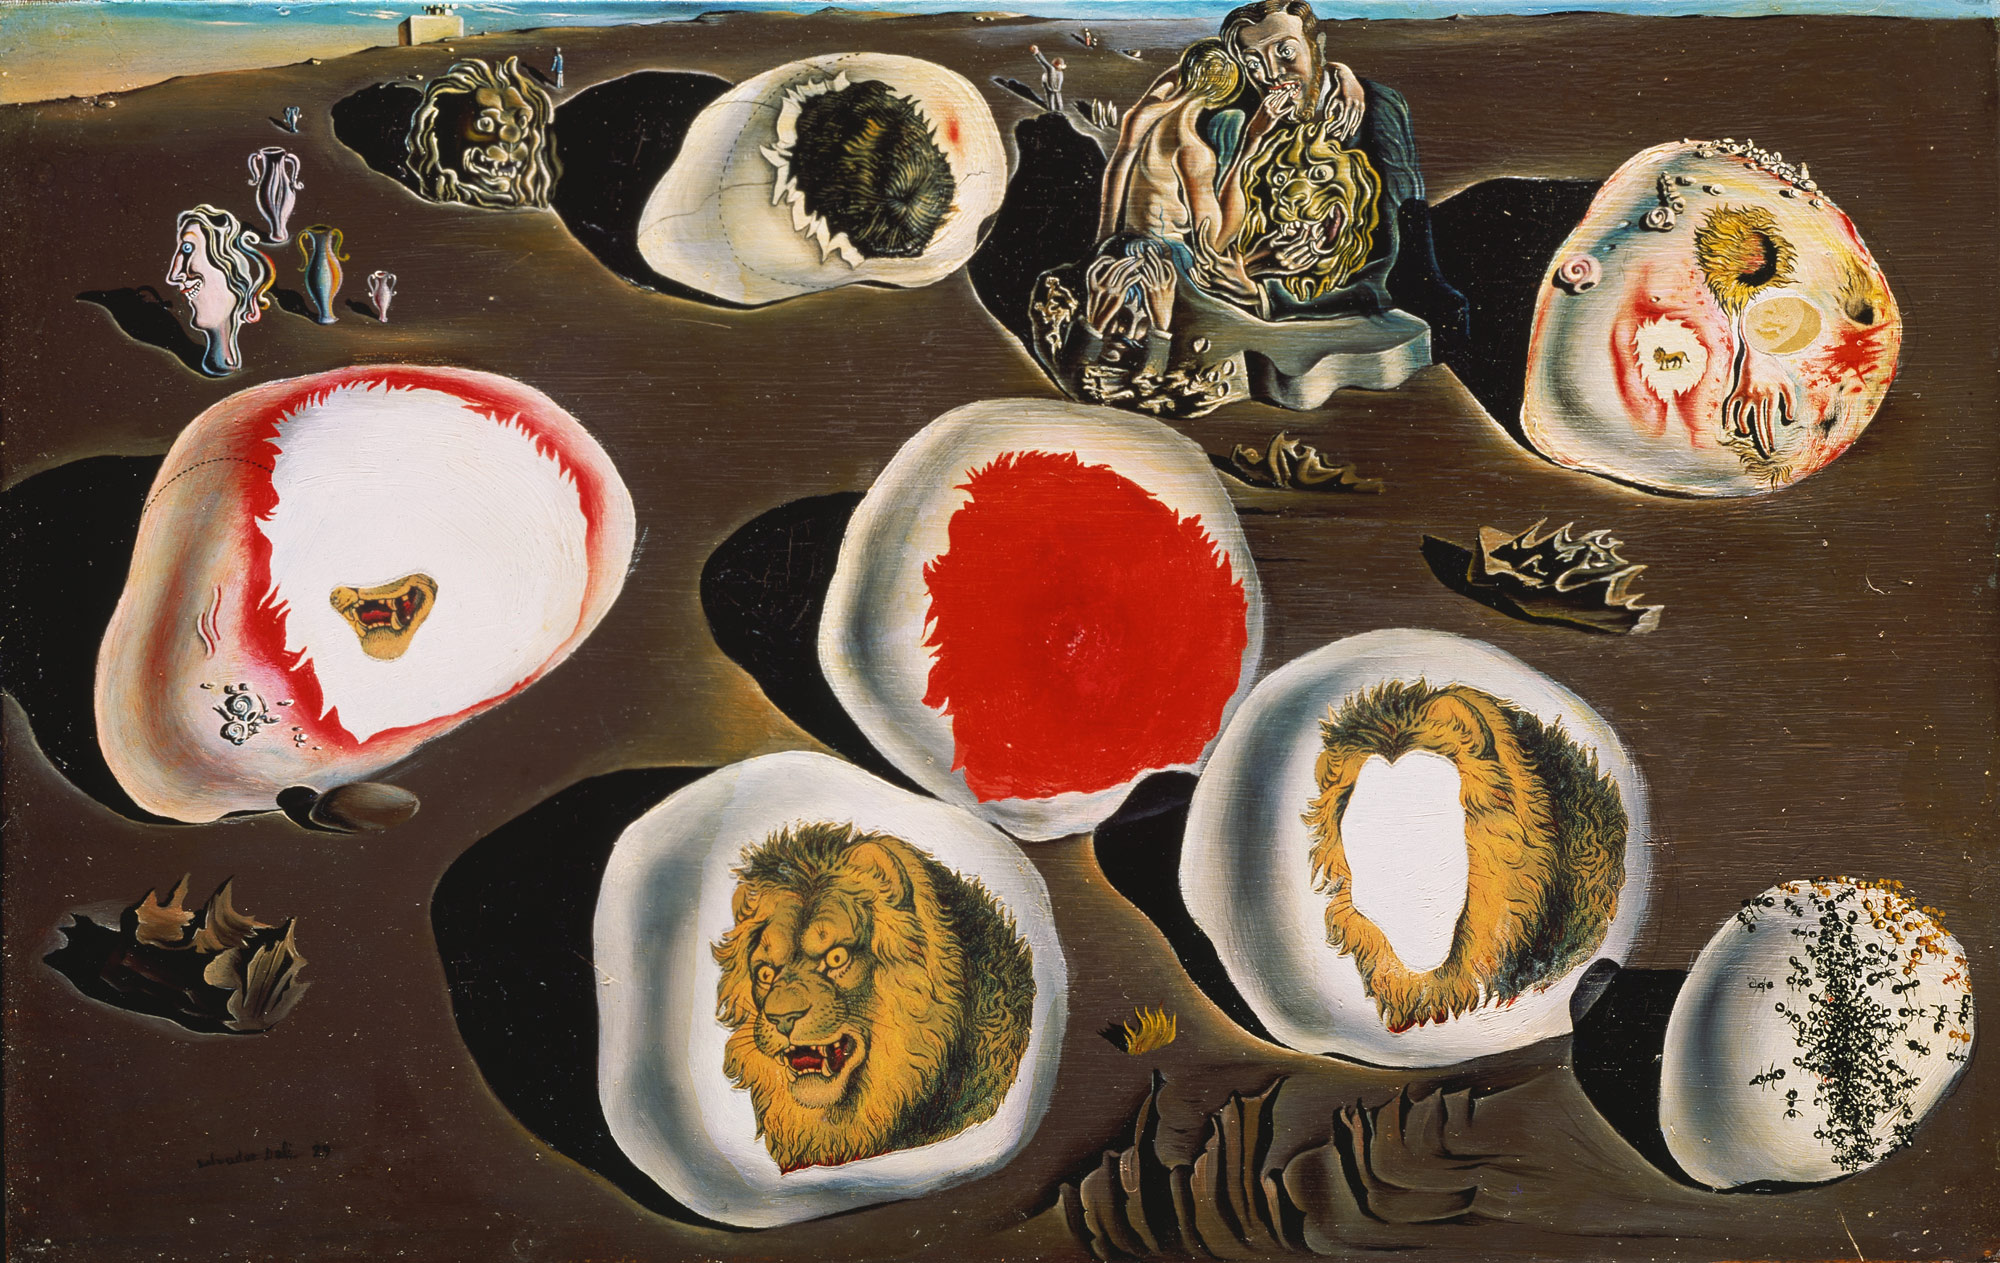 Salvador Dalí,  The Accommodations of Desire , 1929, Metropolitan Museum of Art, New York.